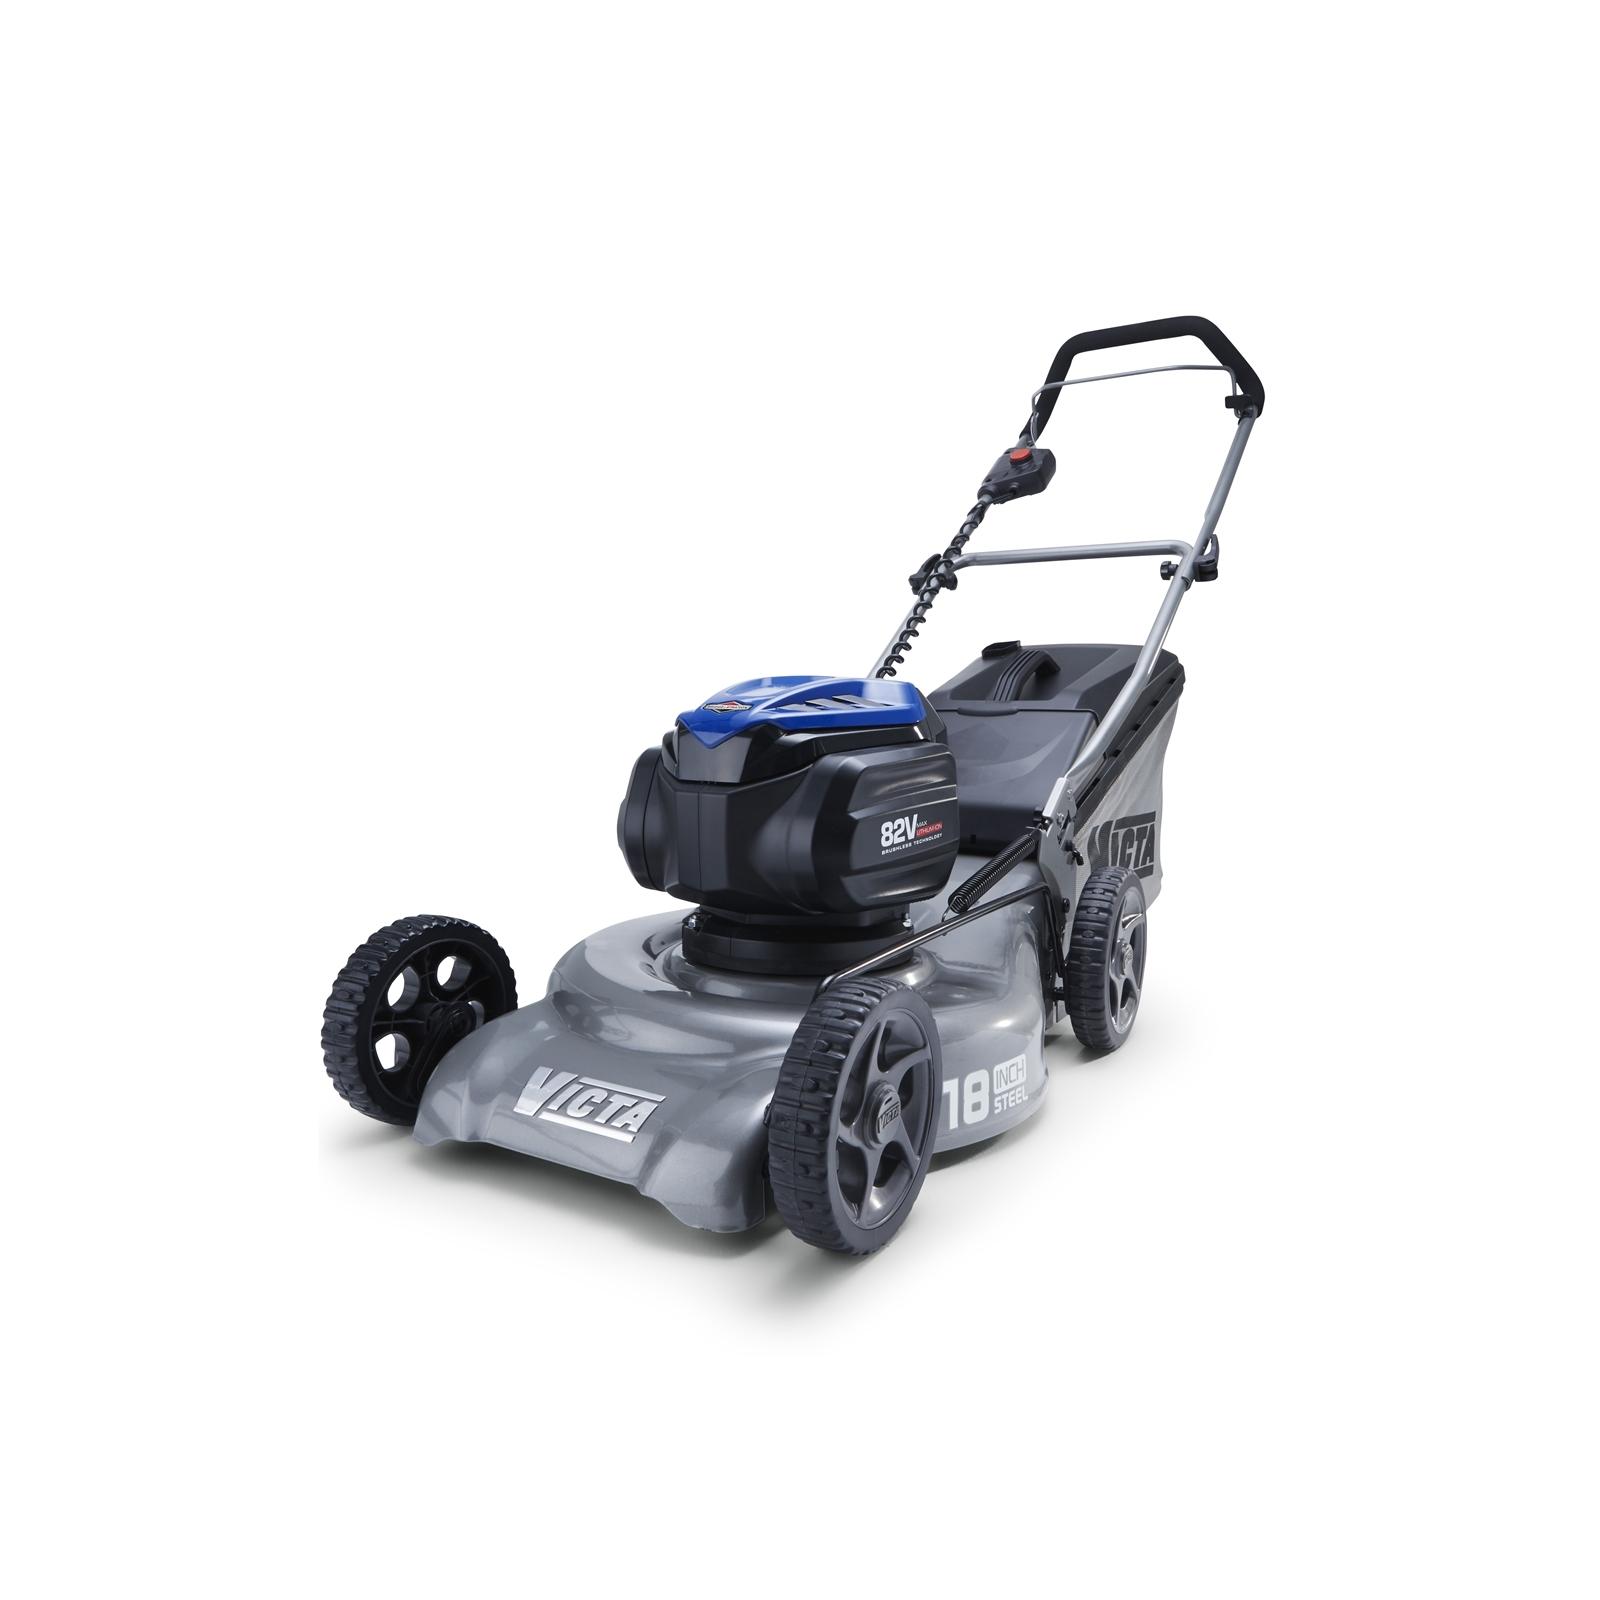 Victa 82V Power Cut Lawn Mower Kit